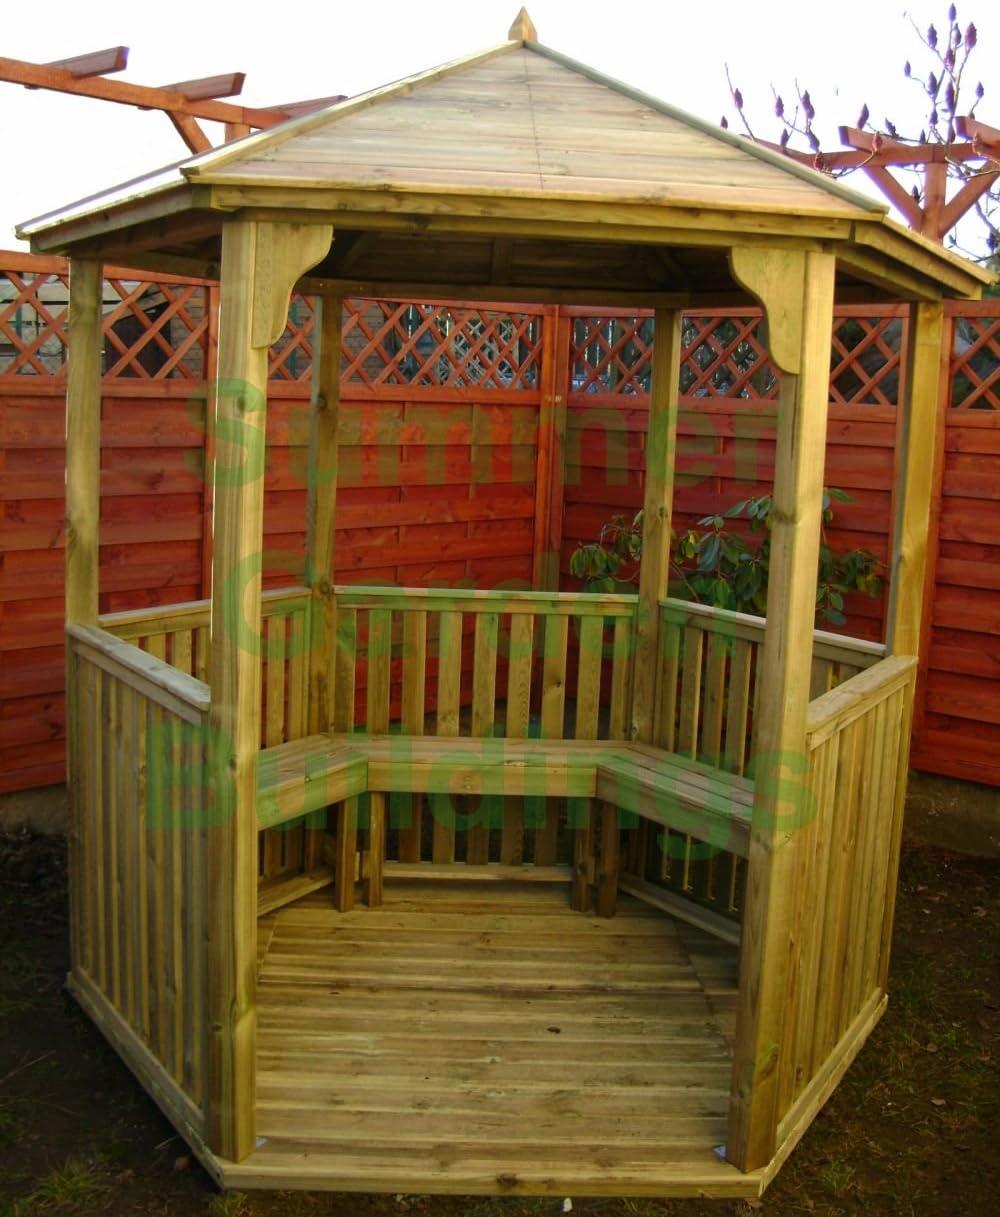 7 x 6 abierto jardín Gazebo Hexagonal de madera – Madera Tratada A ...